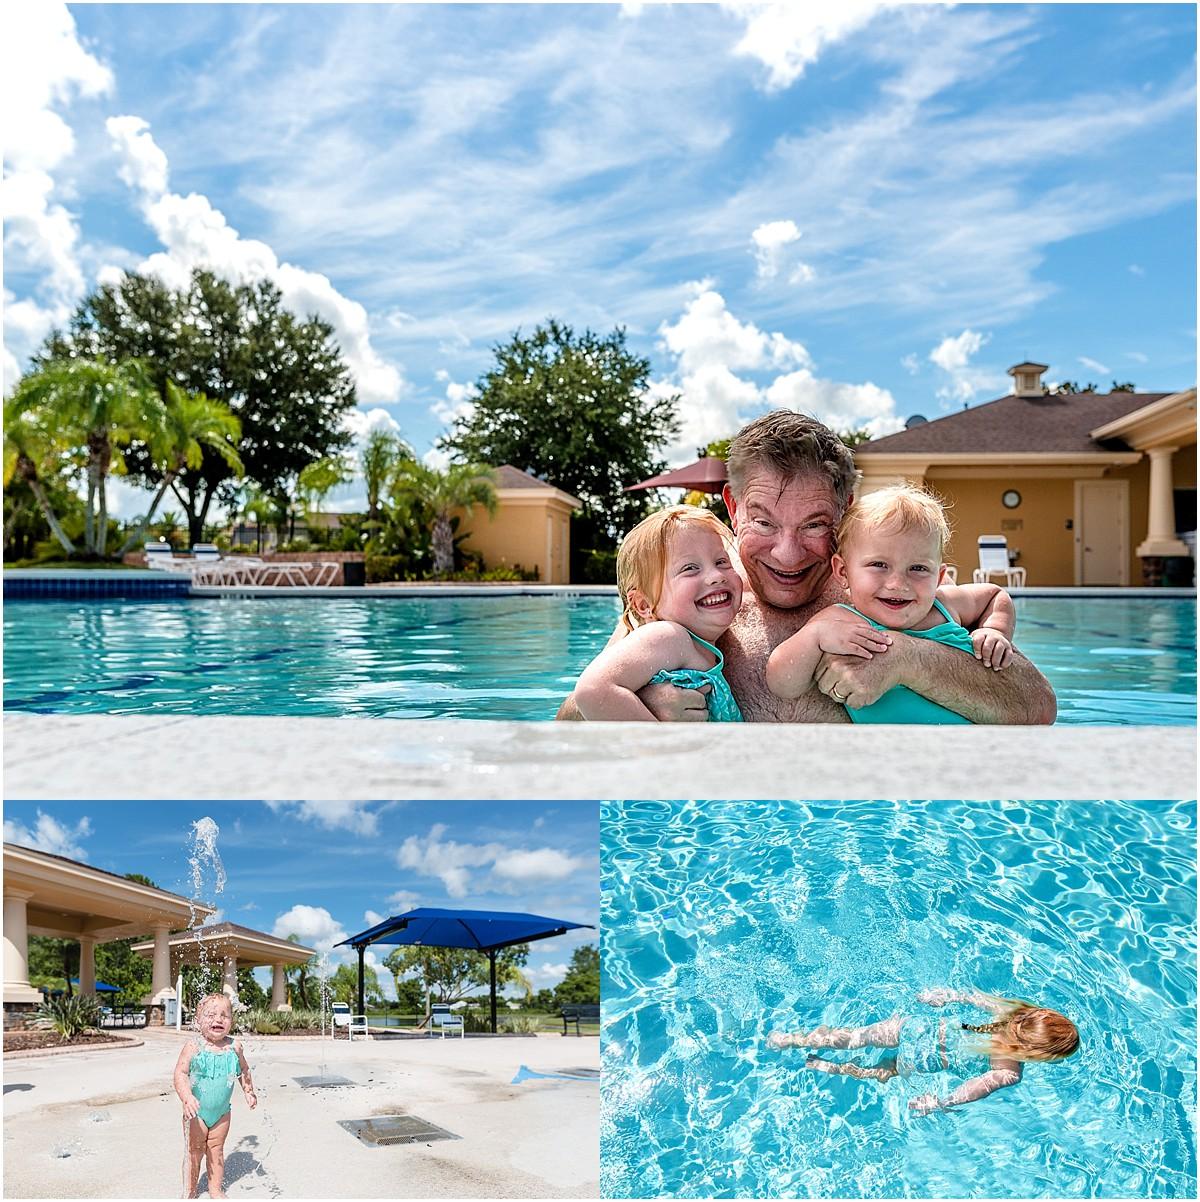 Ashley_Rogers_Photography_South_Florida_Photographer_Orlando_Photographer_Costa_Rica_Photographer_0837.jpg